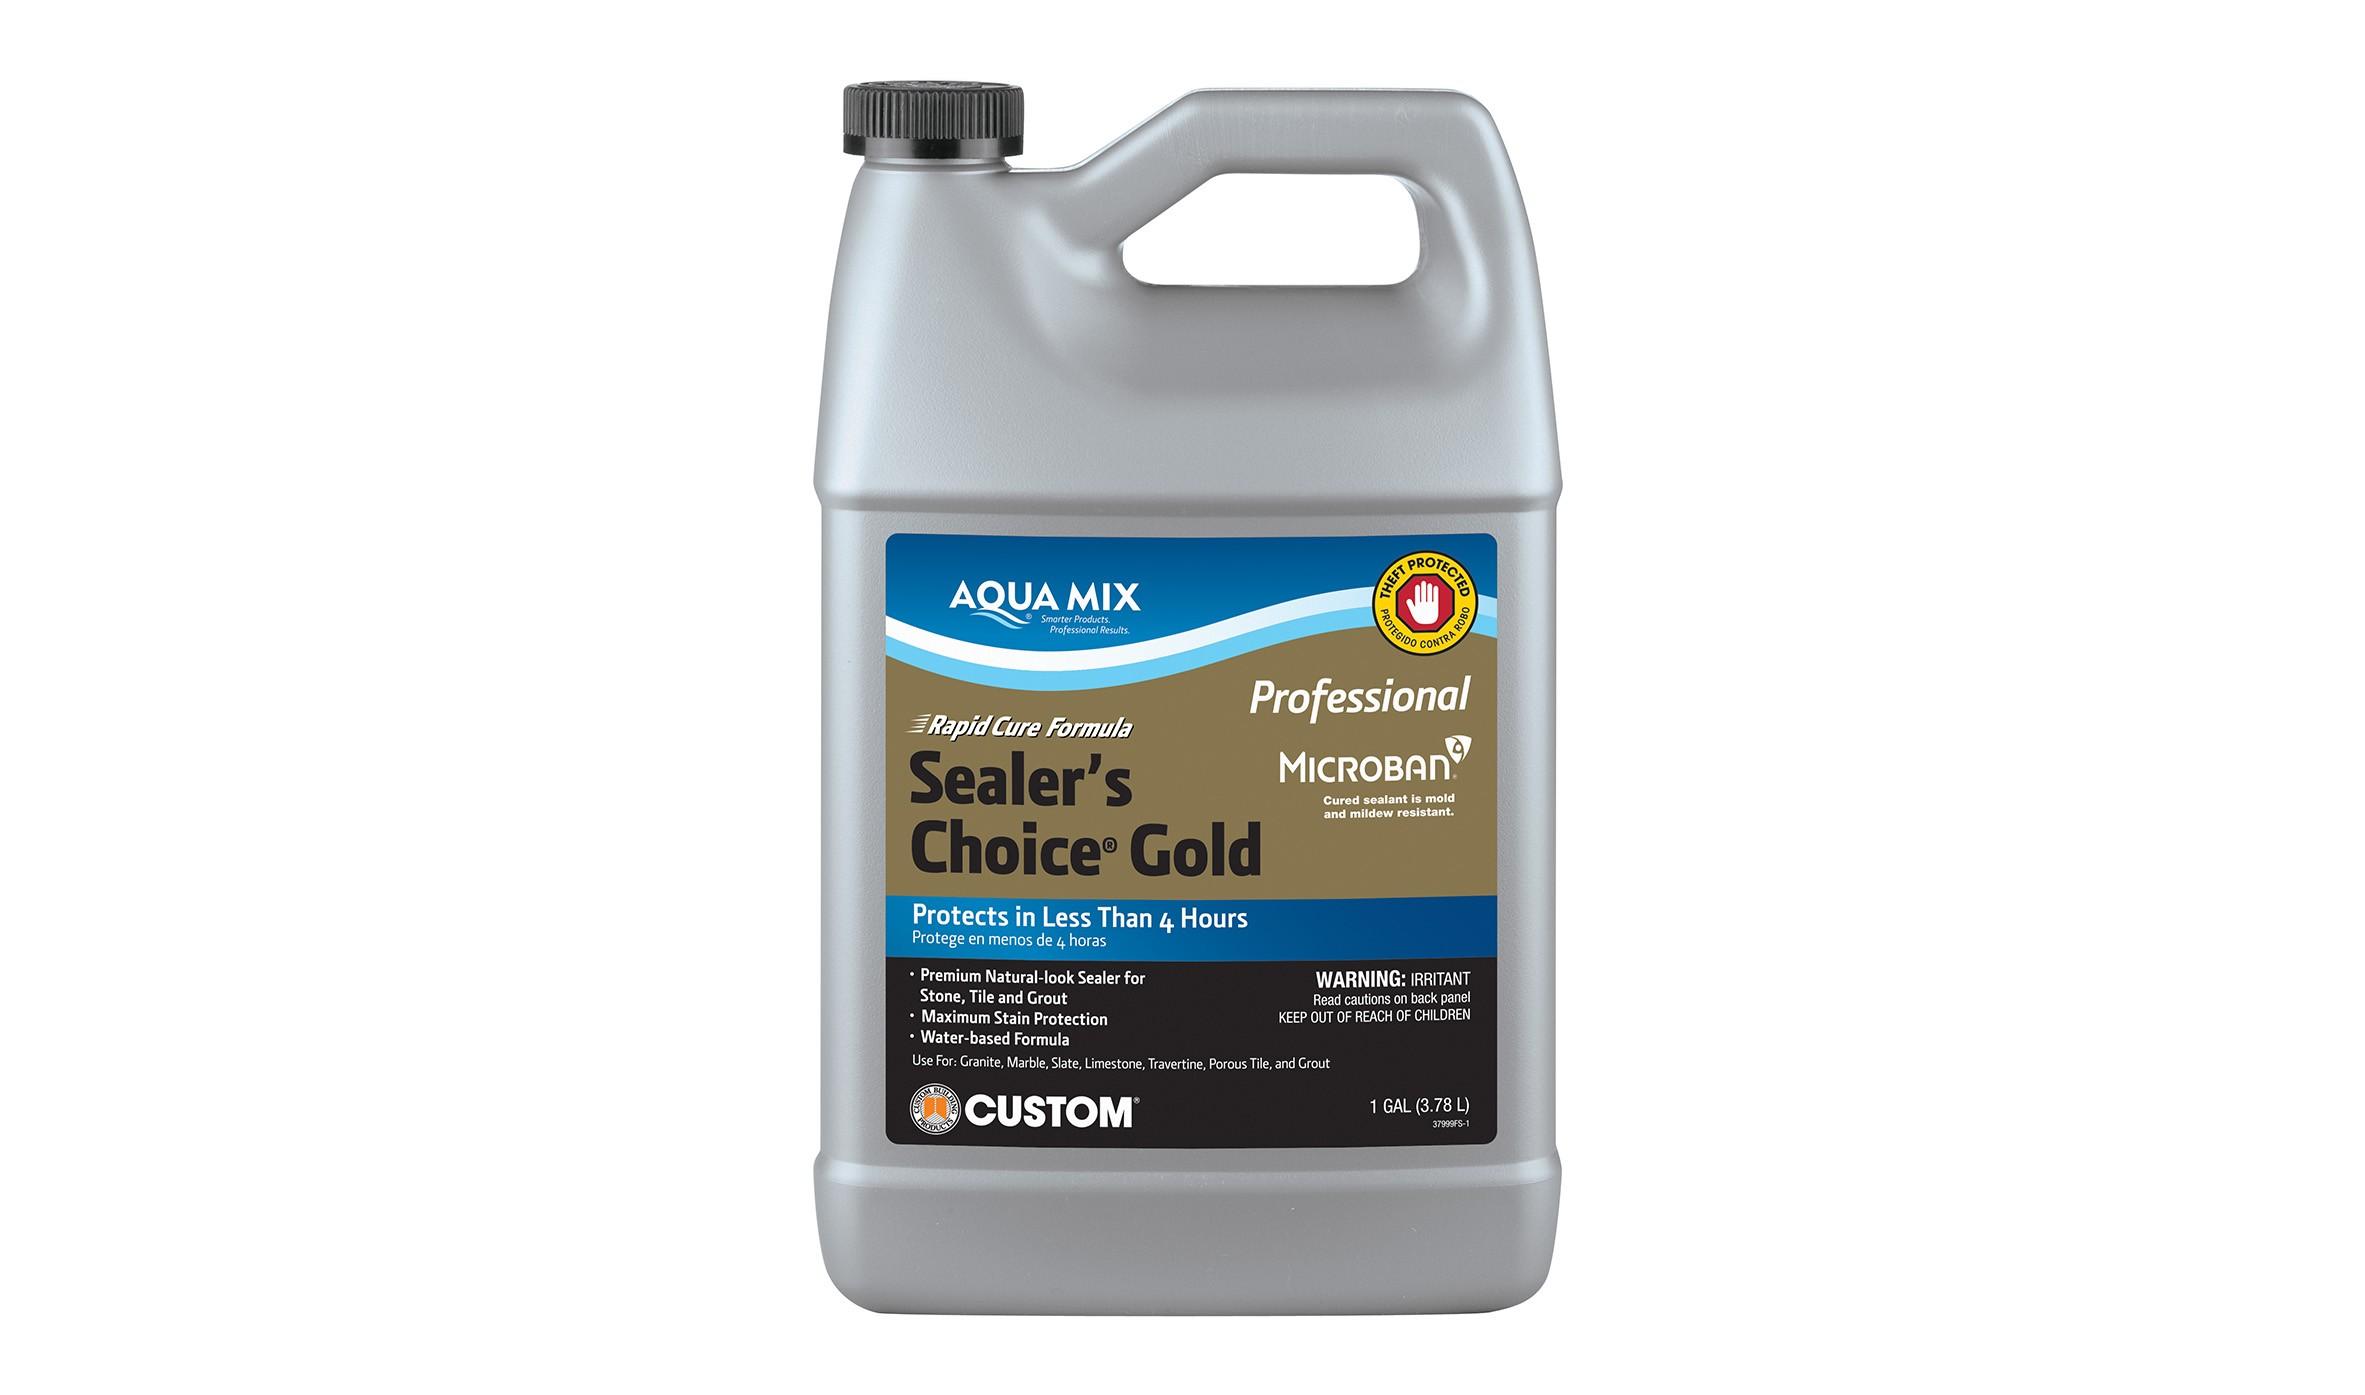 Install-Products-Photos Clean-and-Seal Thumbnail Sealers-Choice-Gold-Thumbnail-505